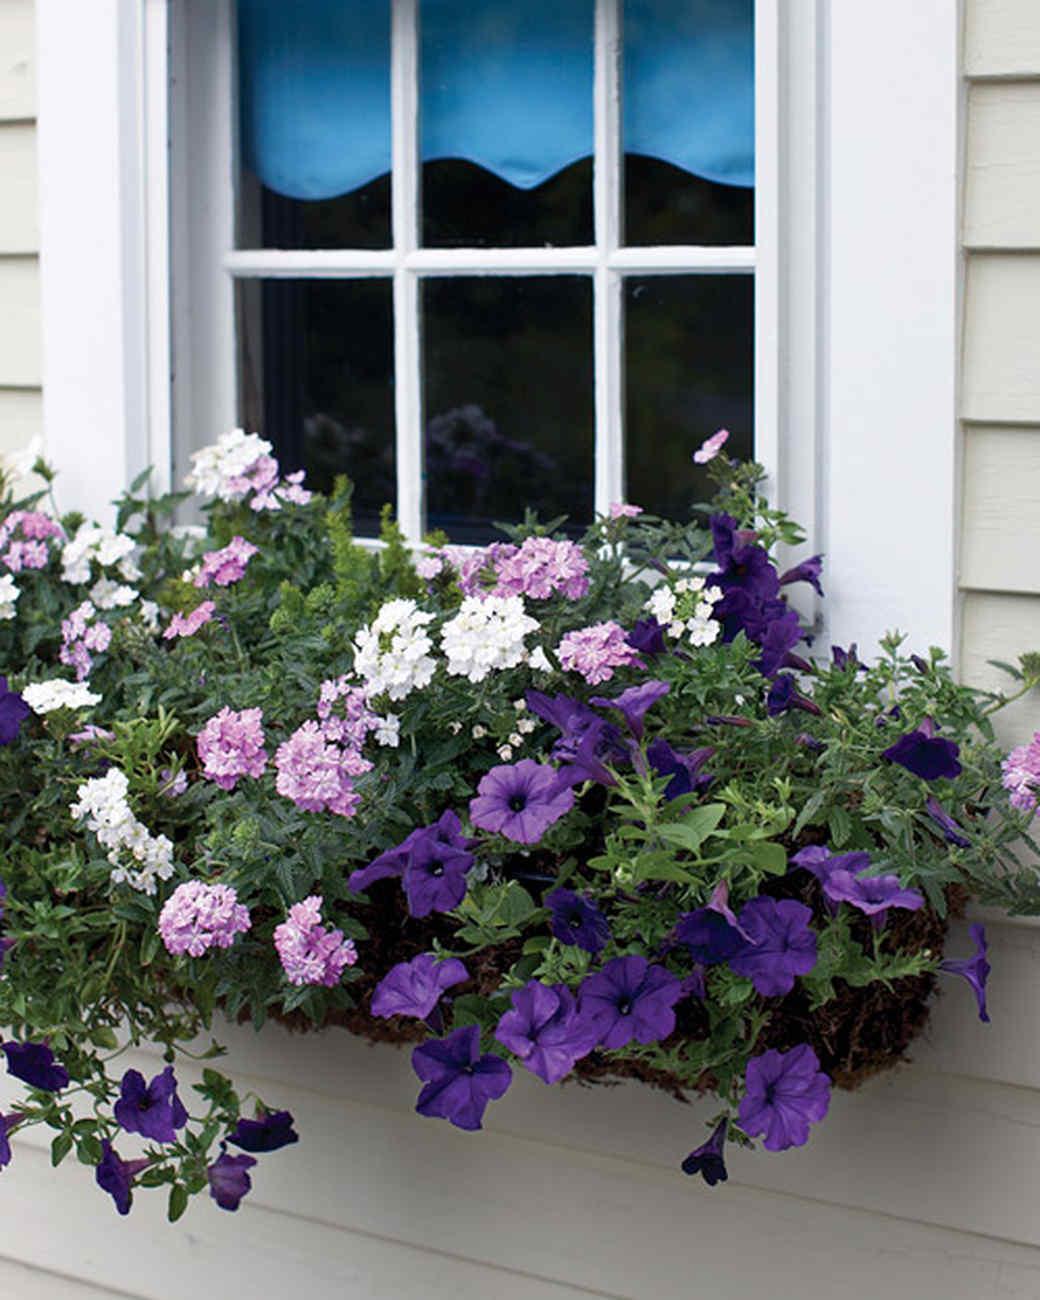 mld104318_0609_purple_windowbox.jpg